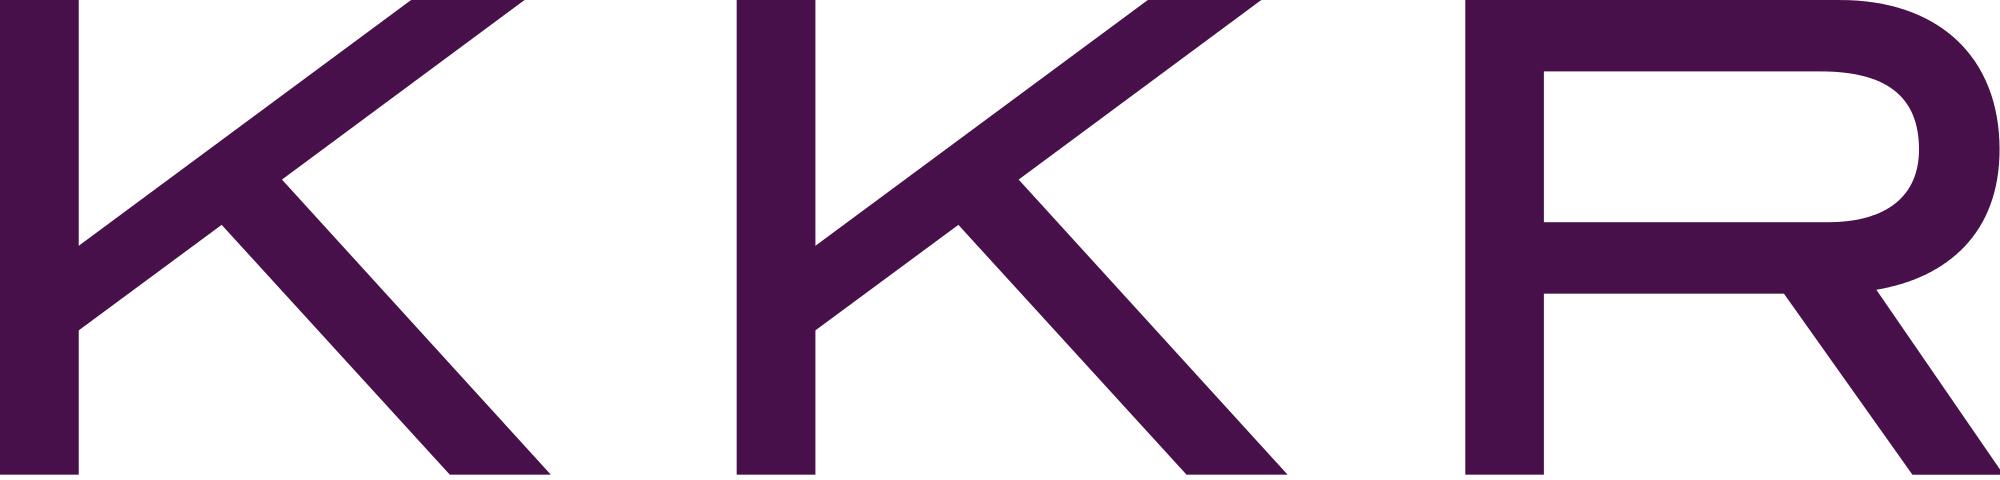 Kkr Logos.